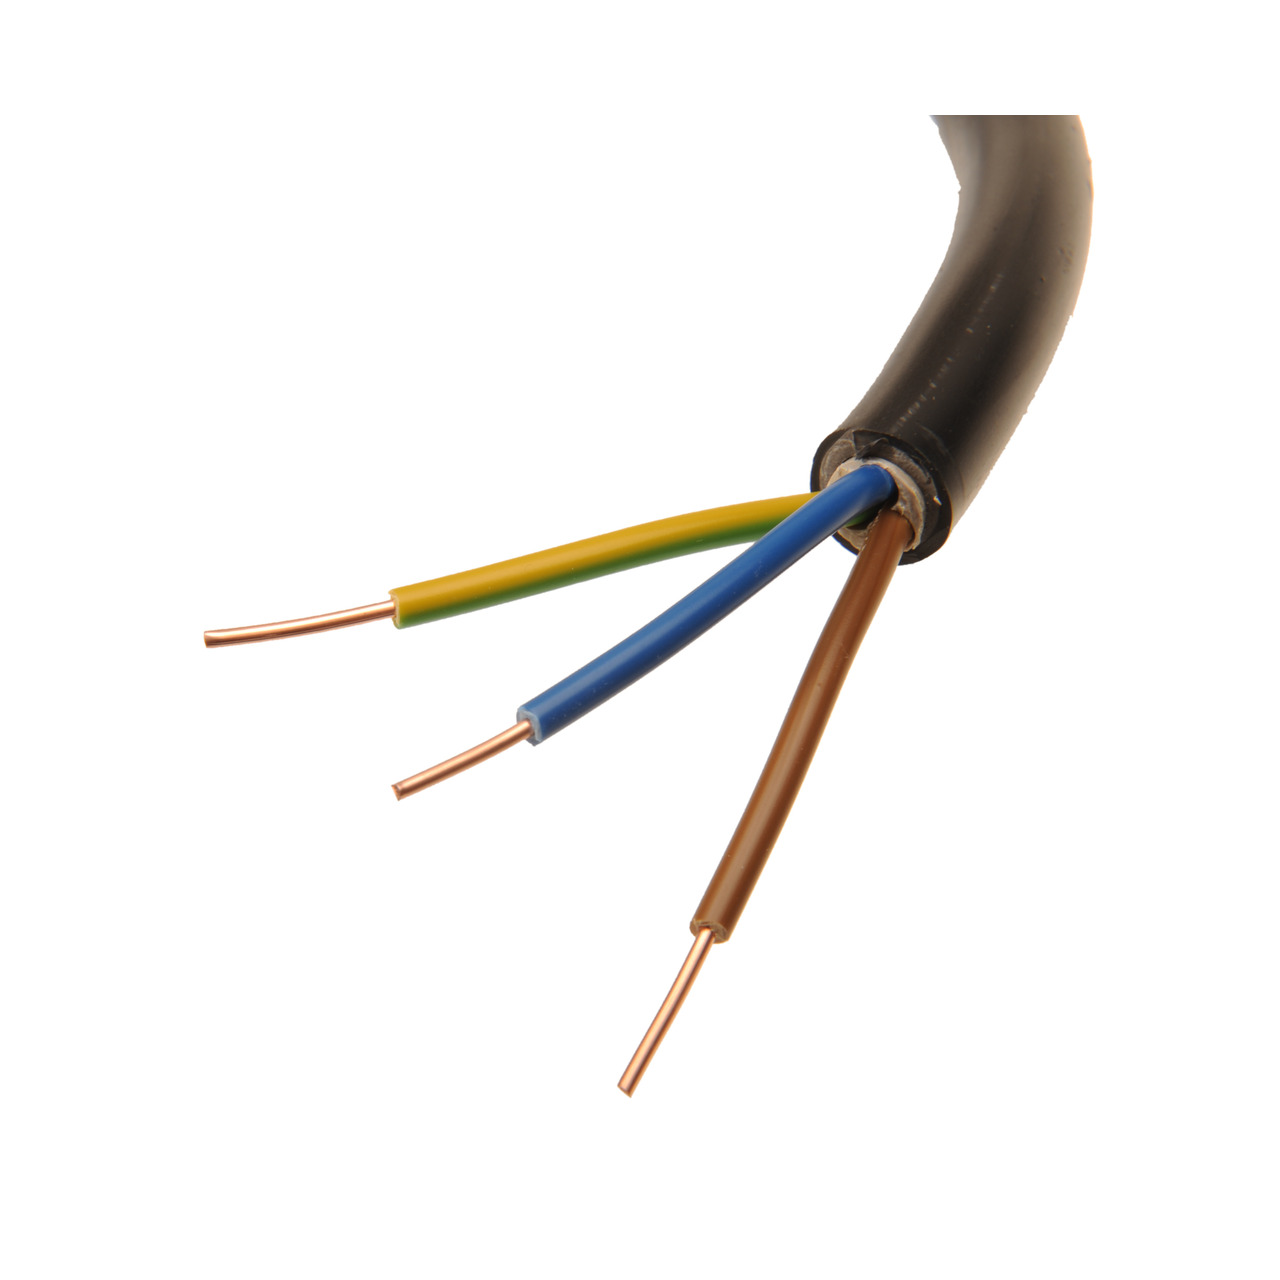 BKL Electronic NYY-J 3x 1-5 mm² Erdkabel- schwarz- 20 m